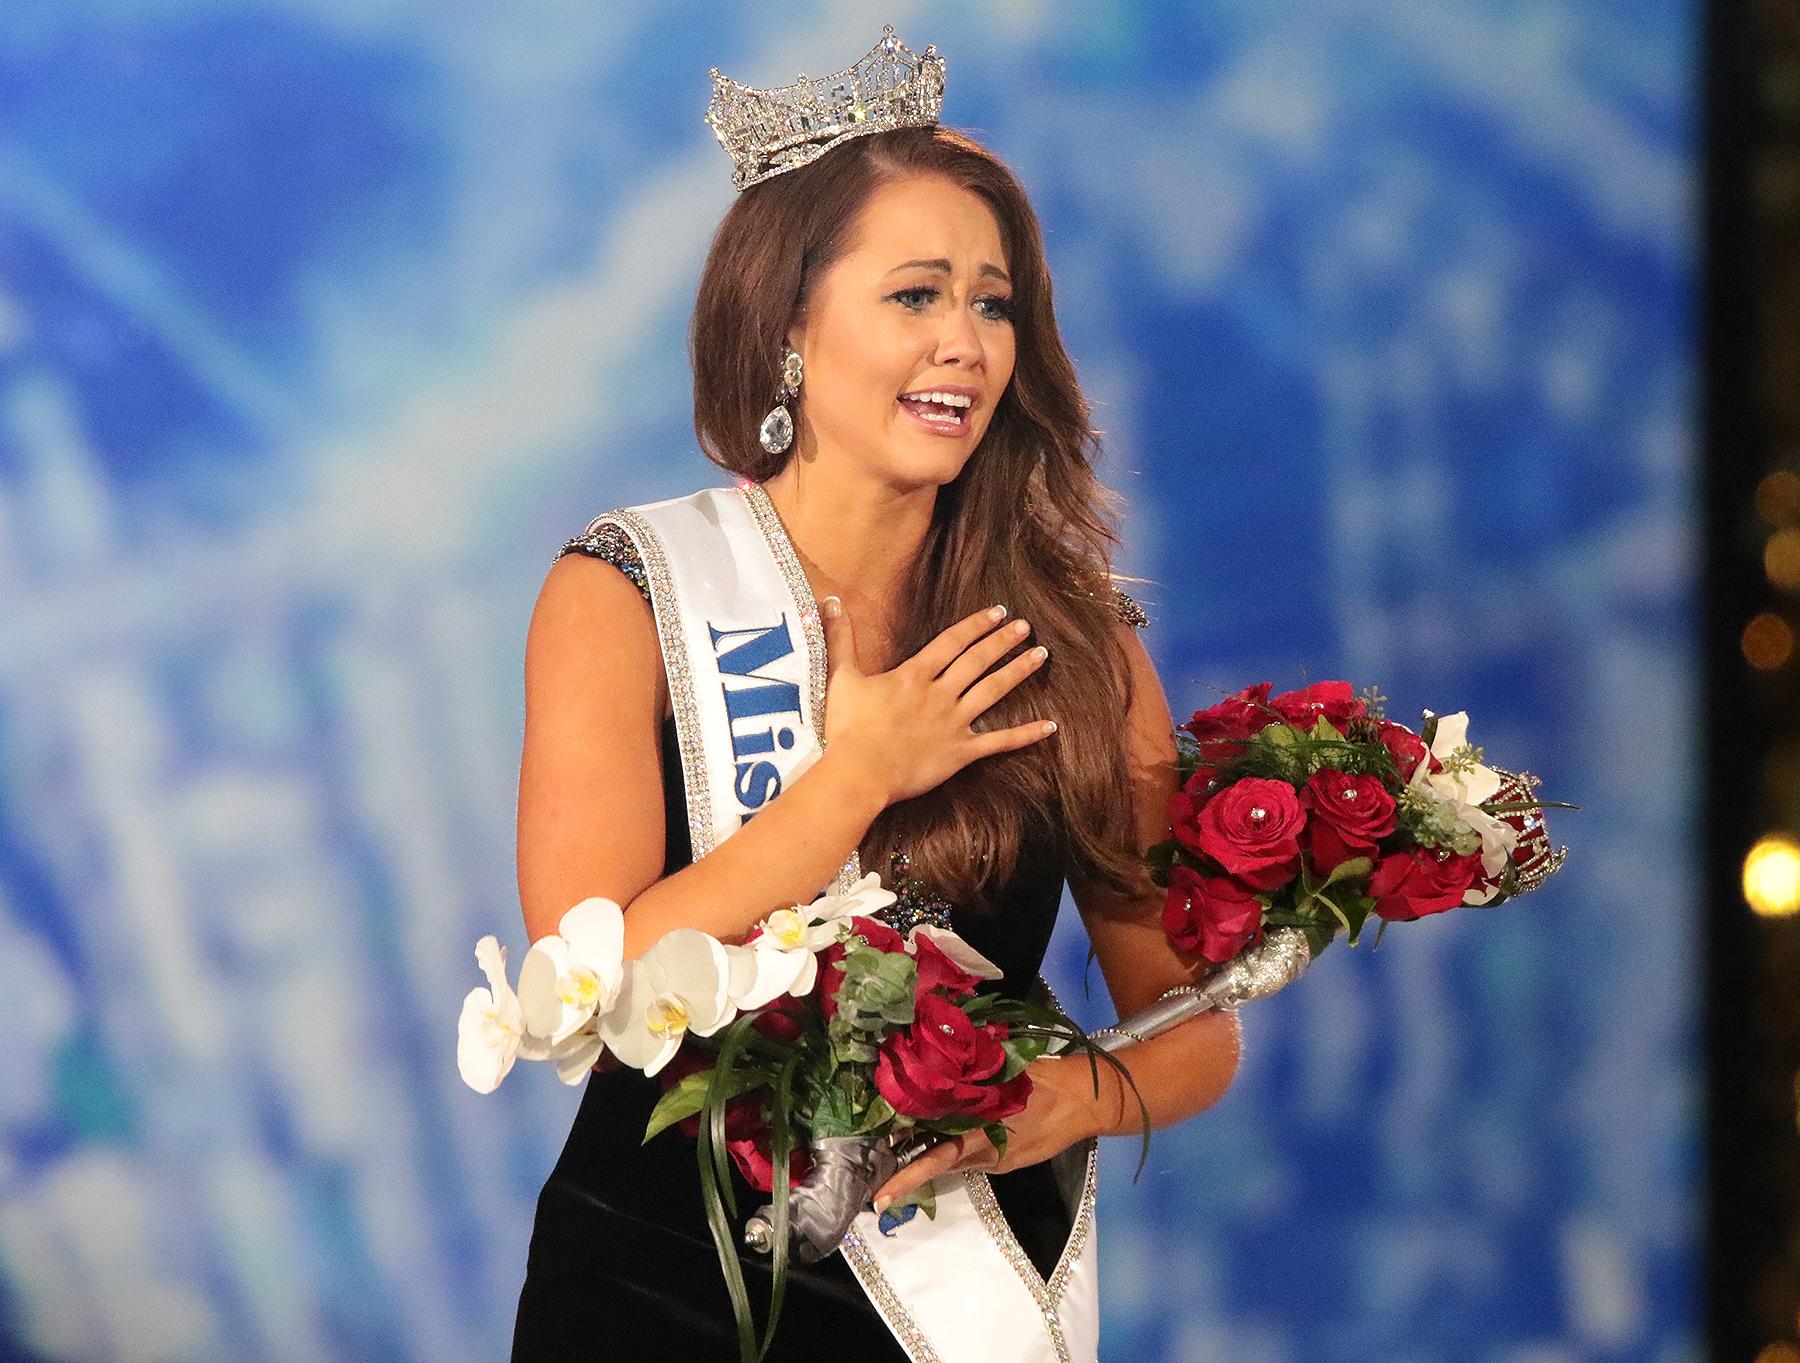 Cara Mund Miss America 2018 Family, Age, Bio, Height, Talent